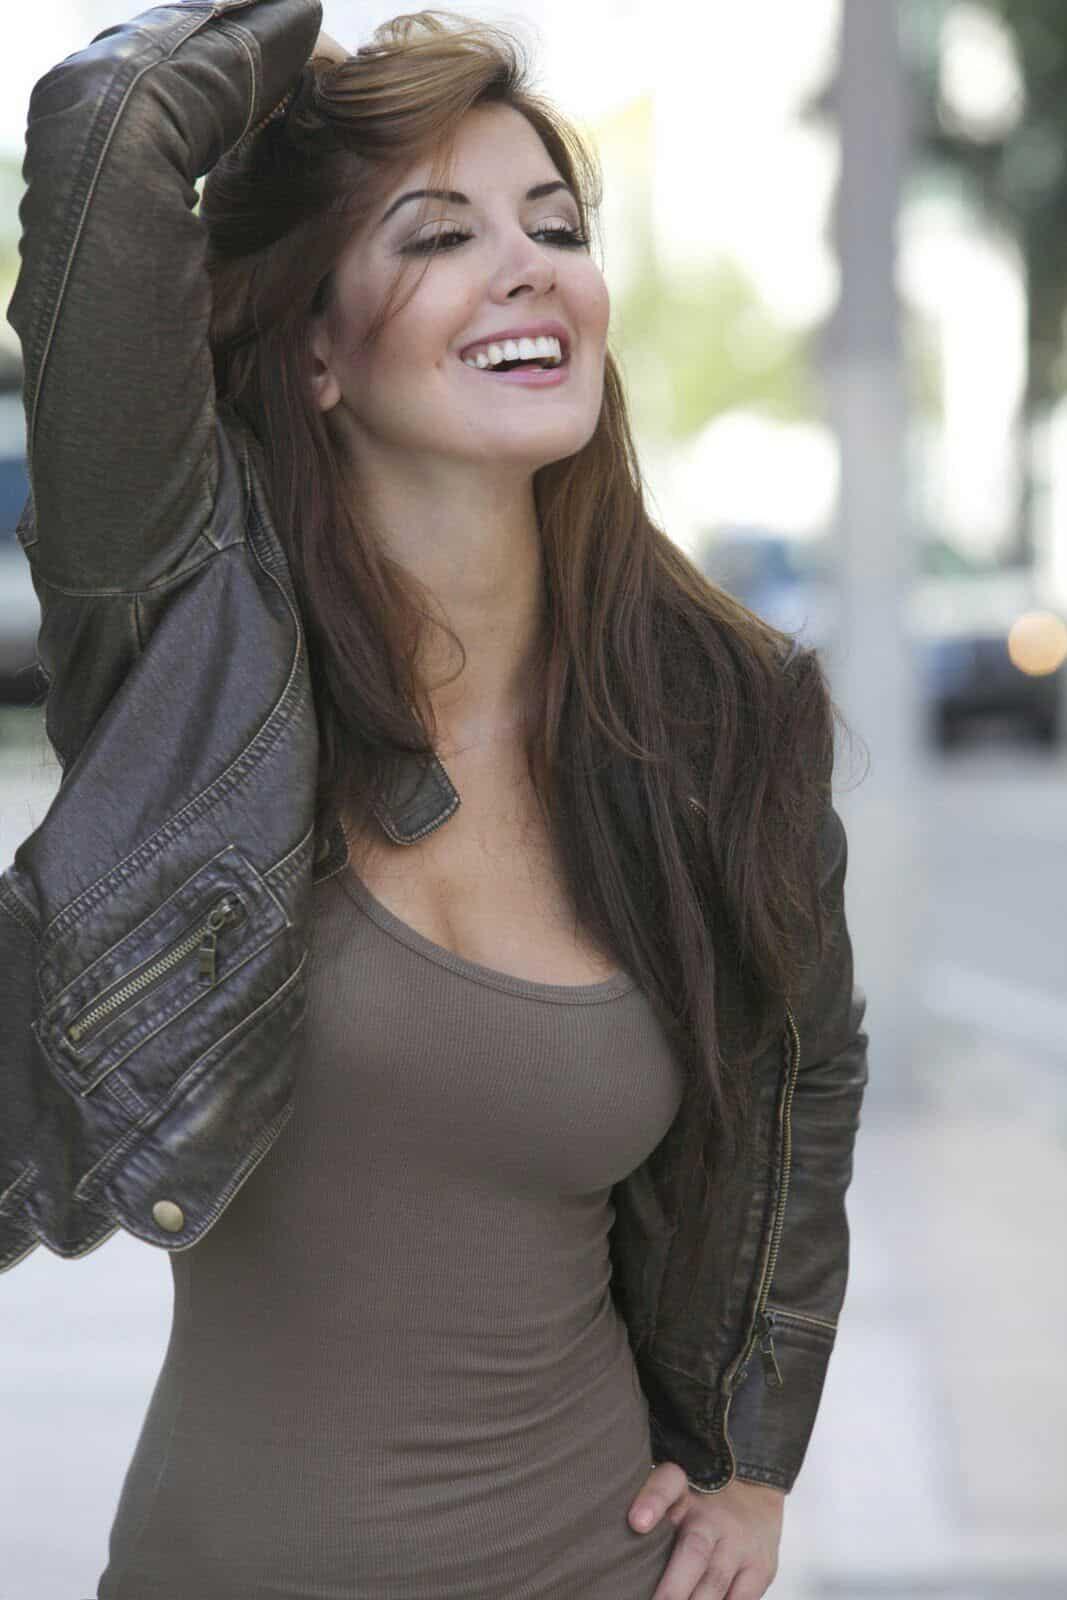 Priscila Perales sweet smile